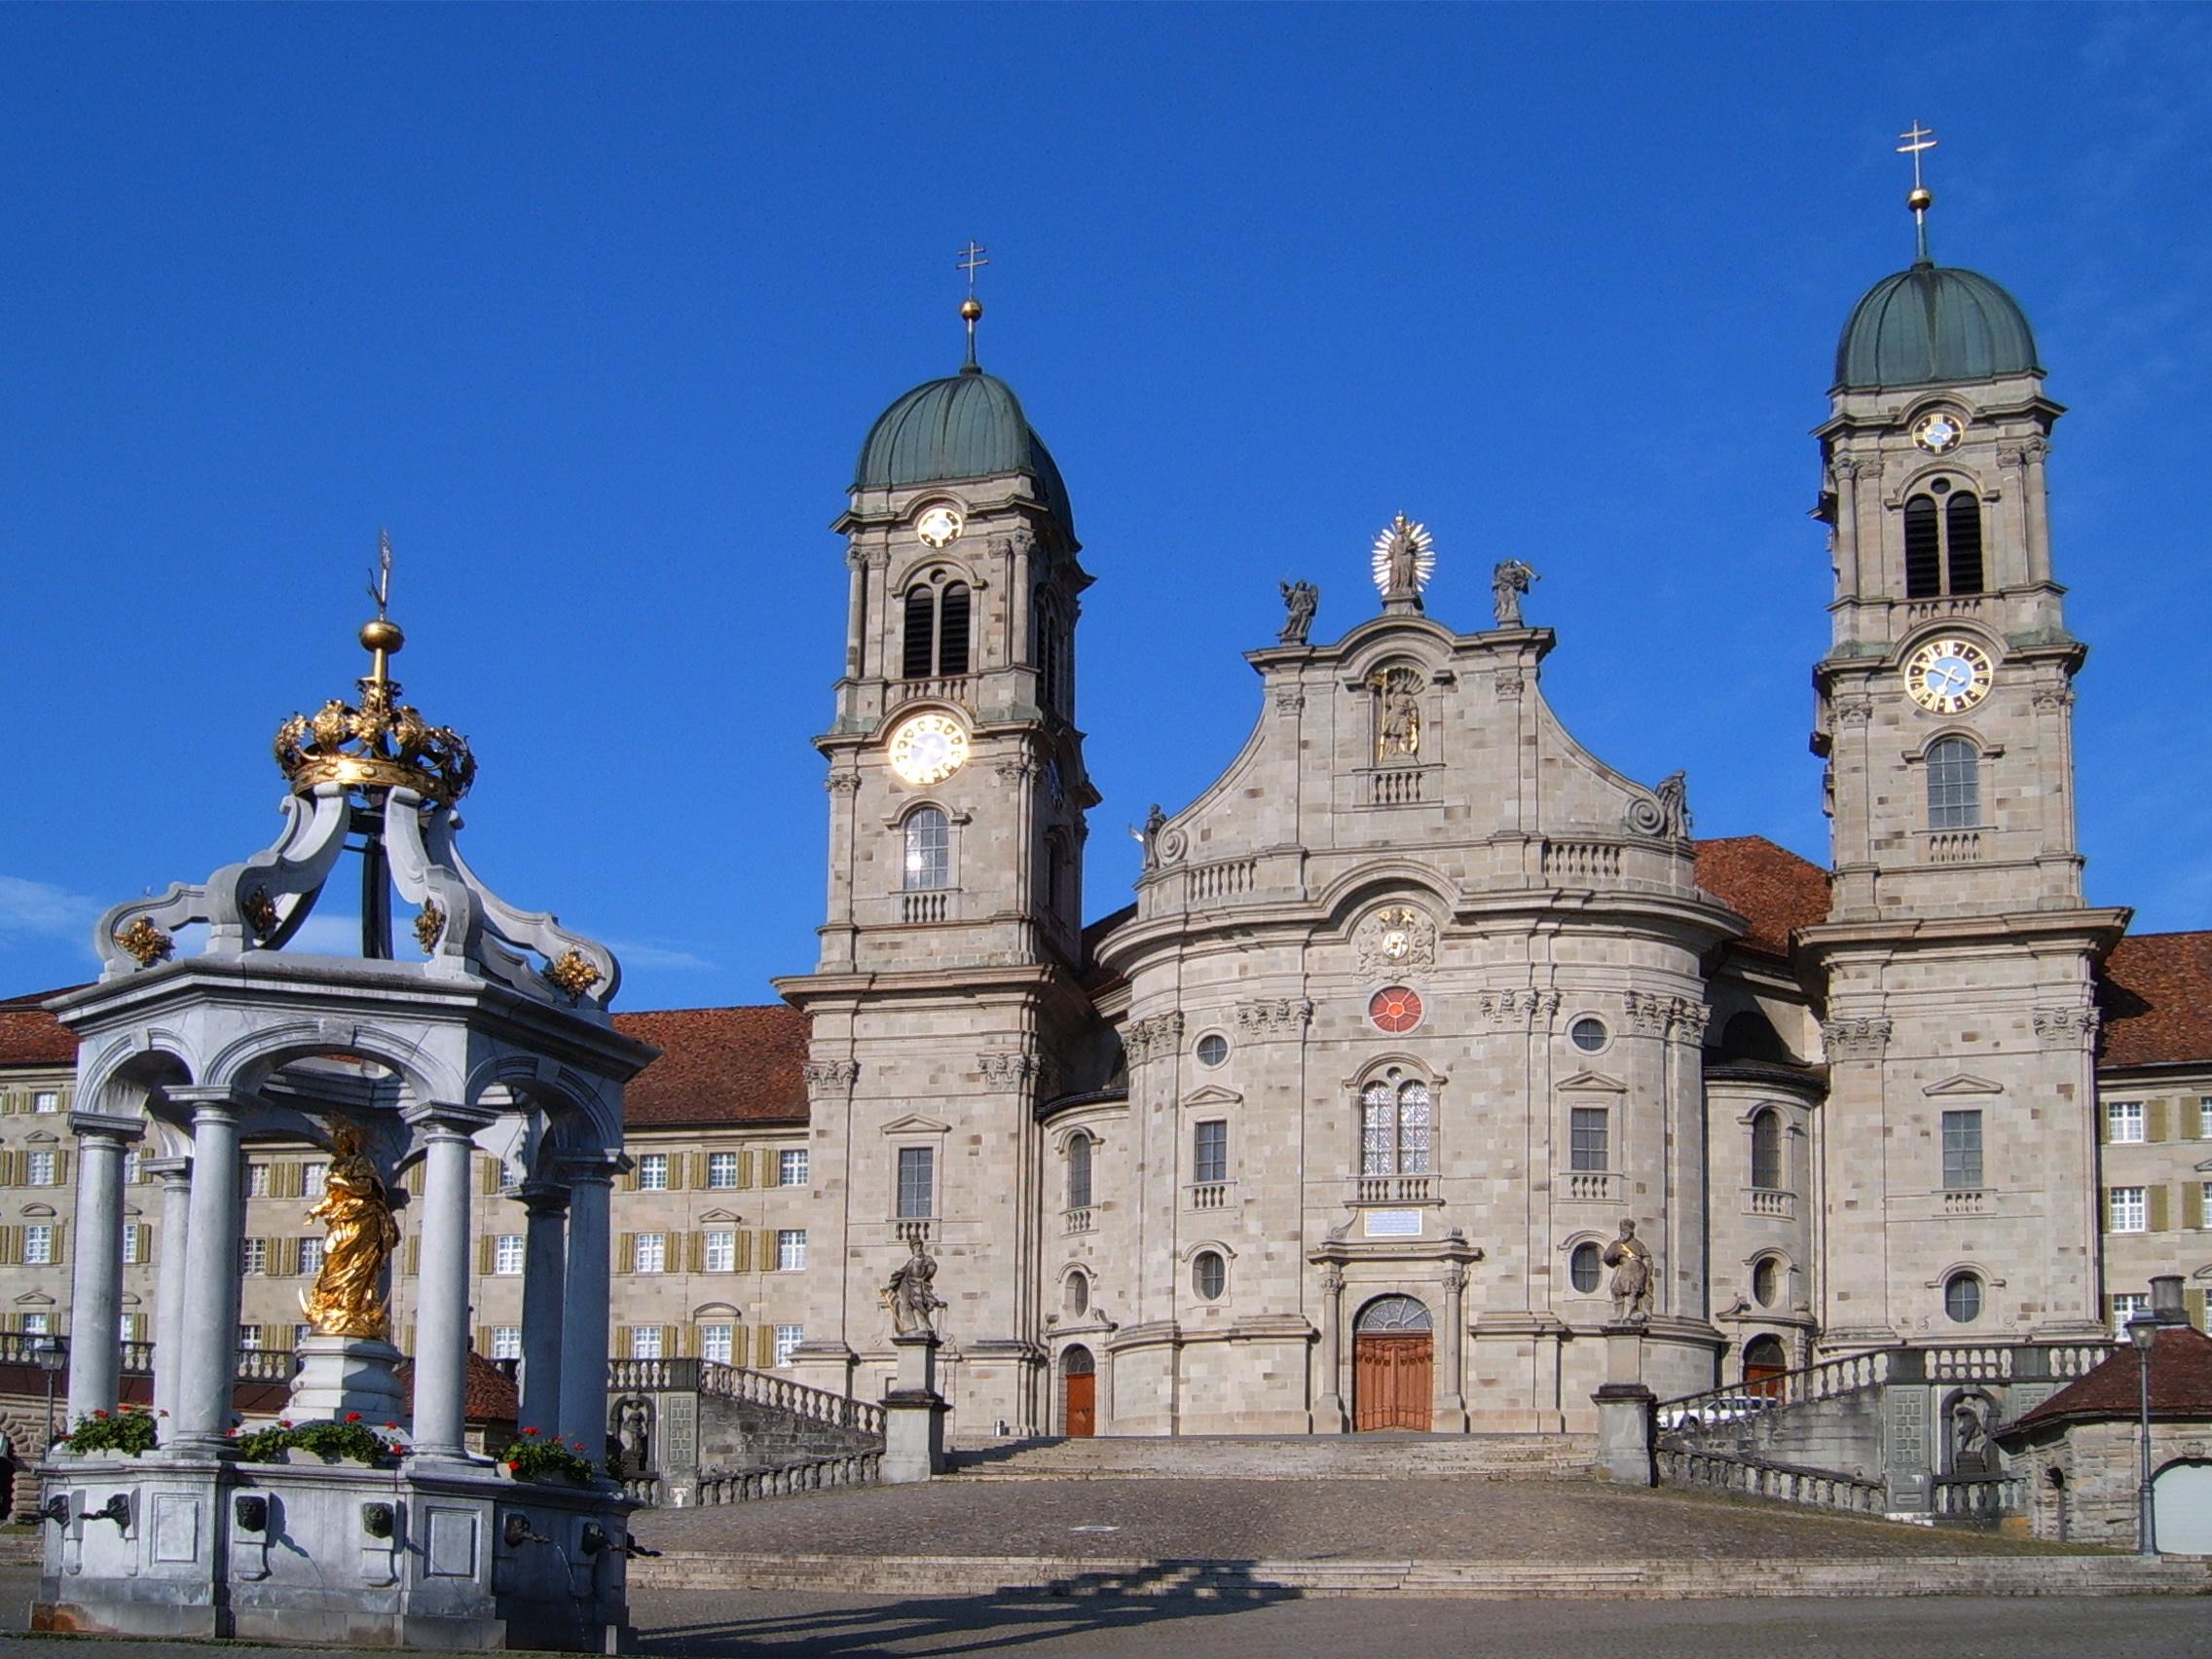 Abbaye Notre-Dame d'Einsiedeln @ wikimedia commons / Markus Bernet